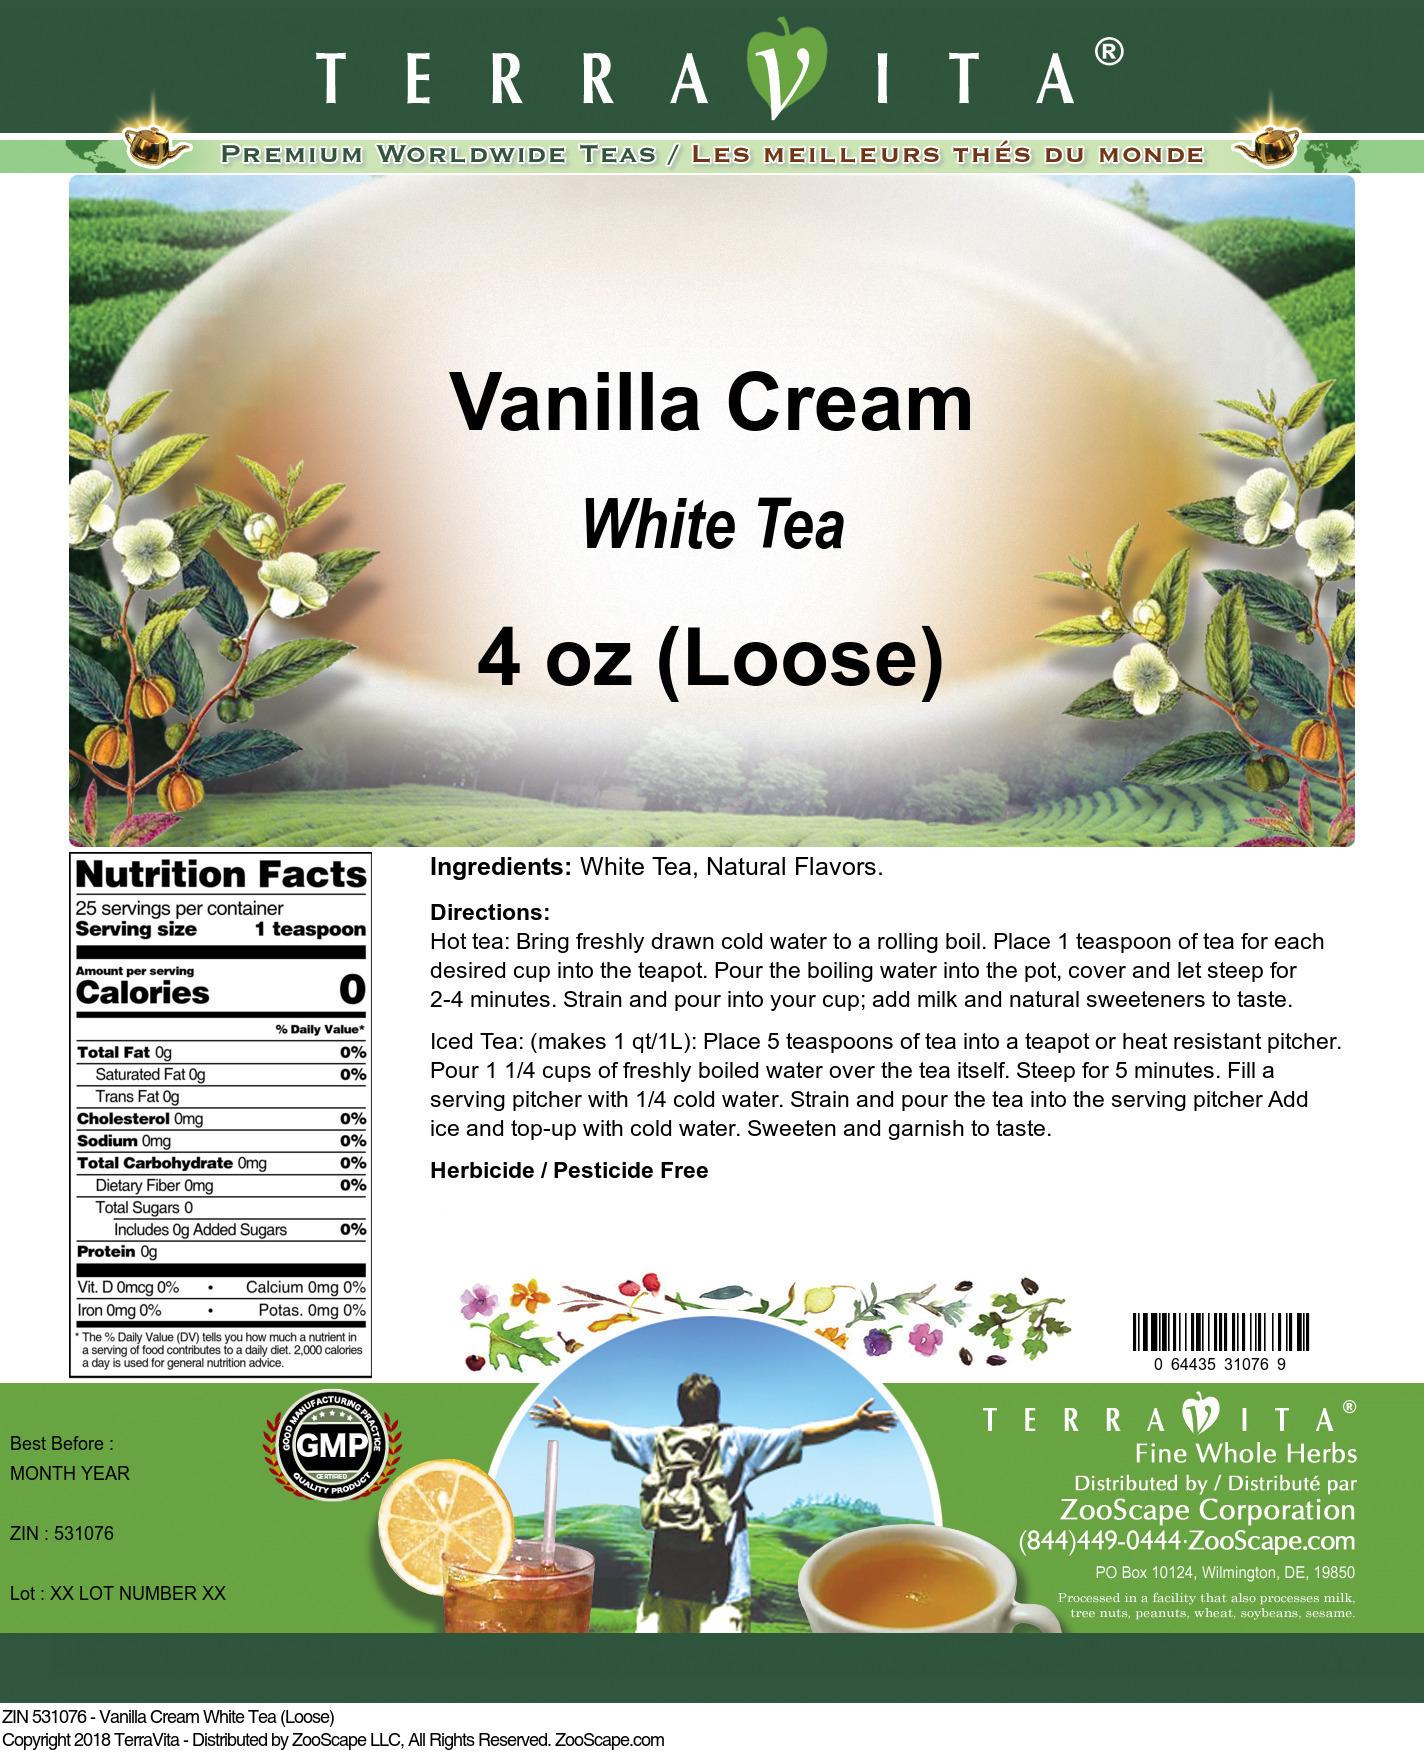 Vanilla Cream White Tea